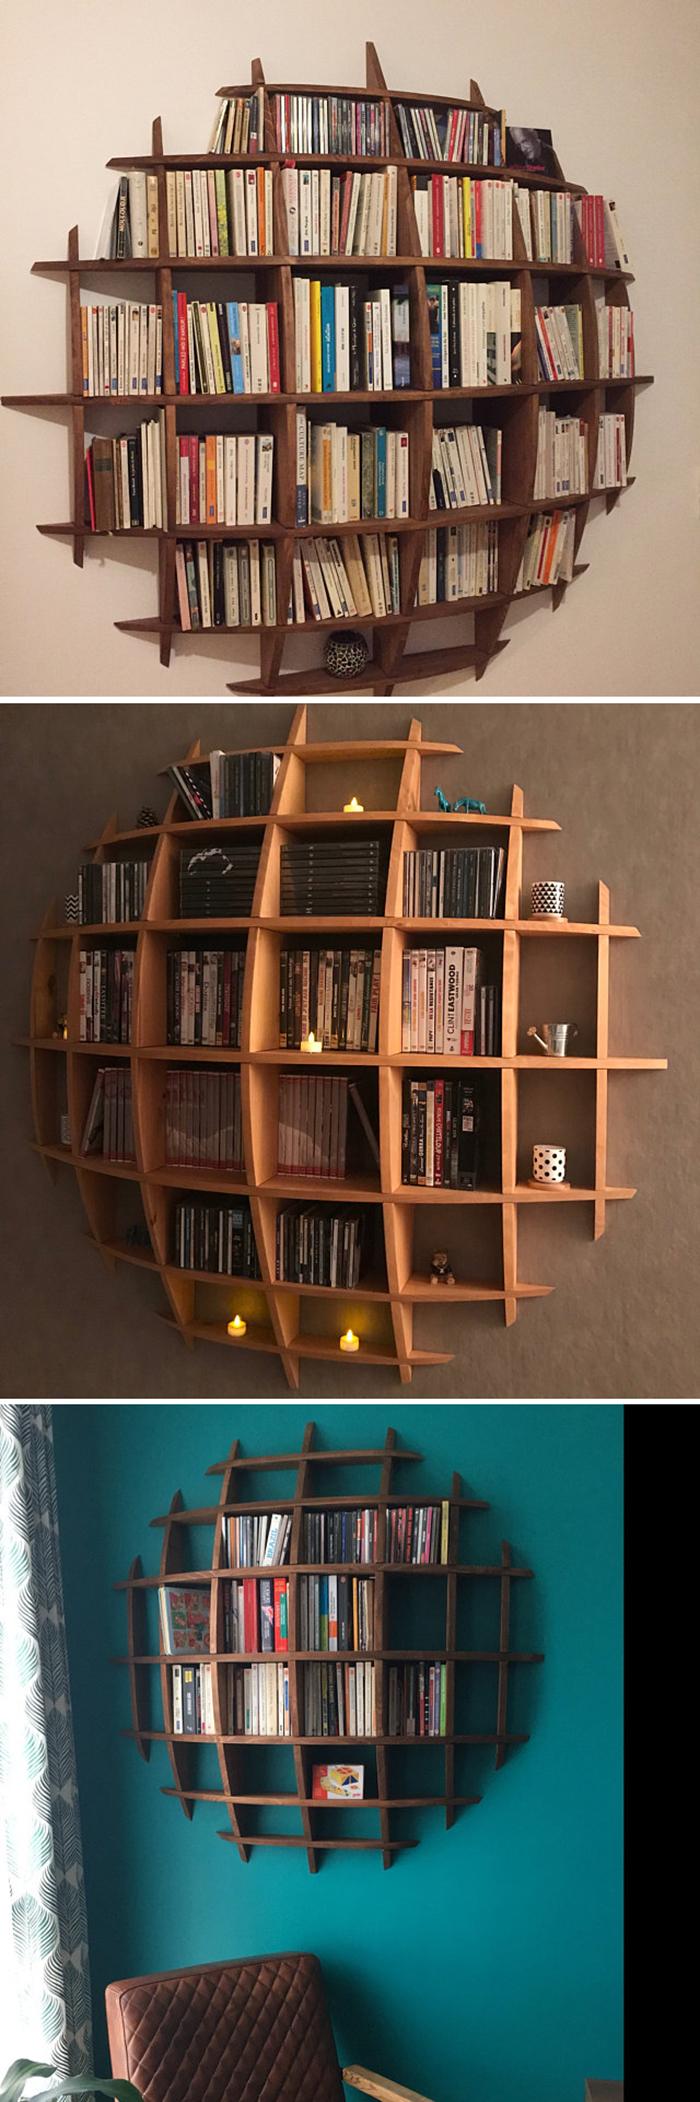 3d sphere bookshelf sinking illusion